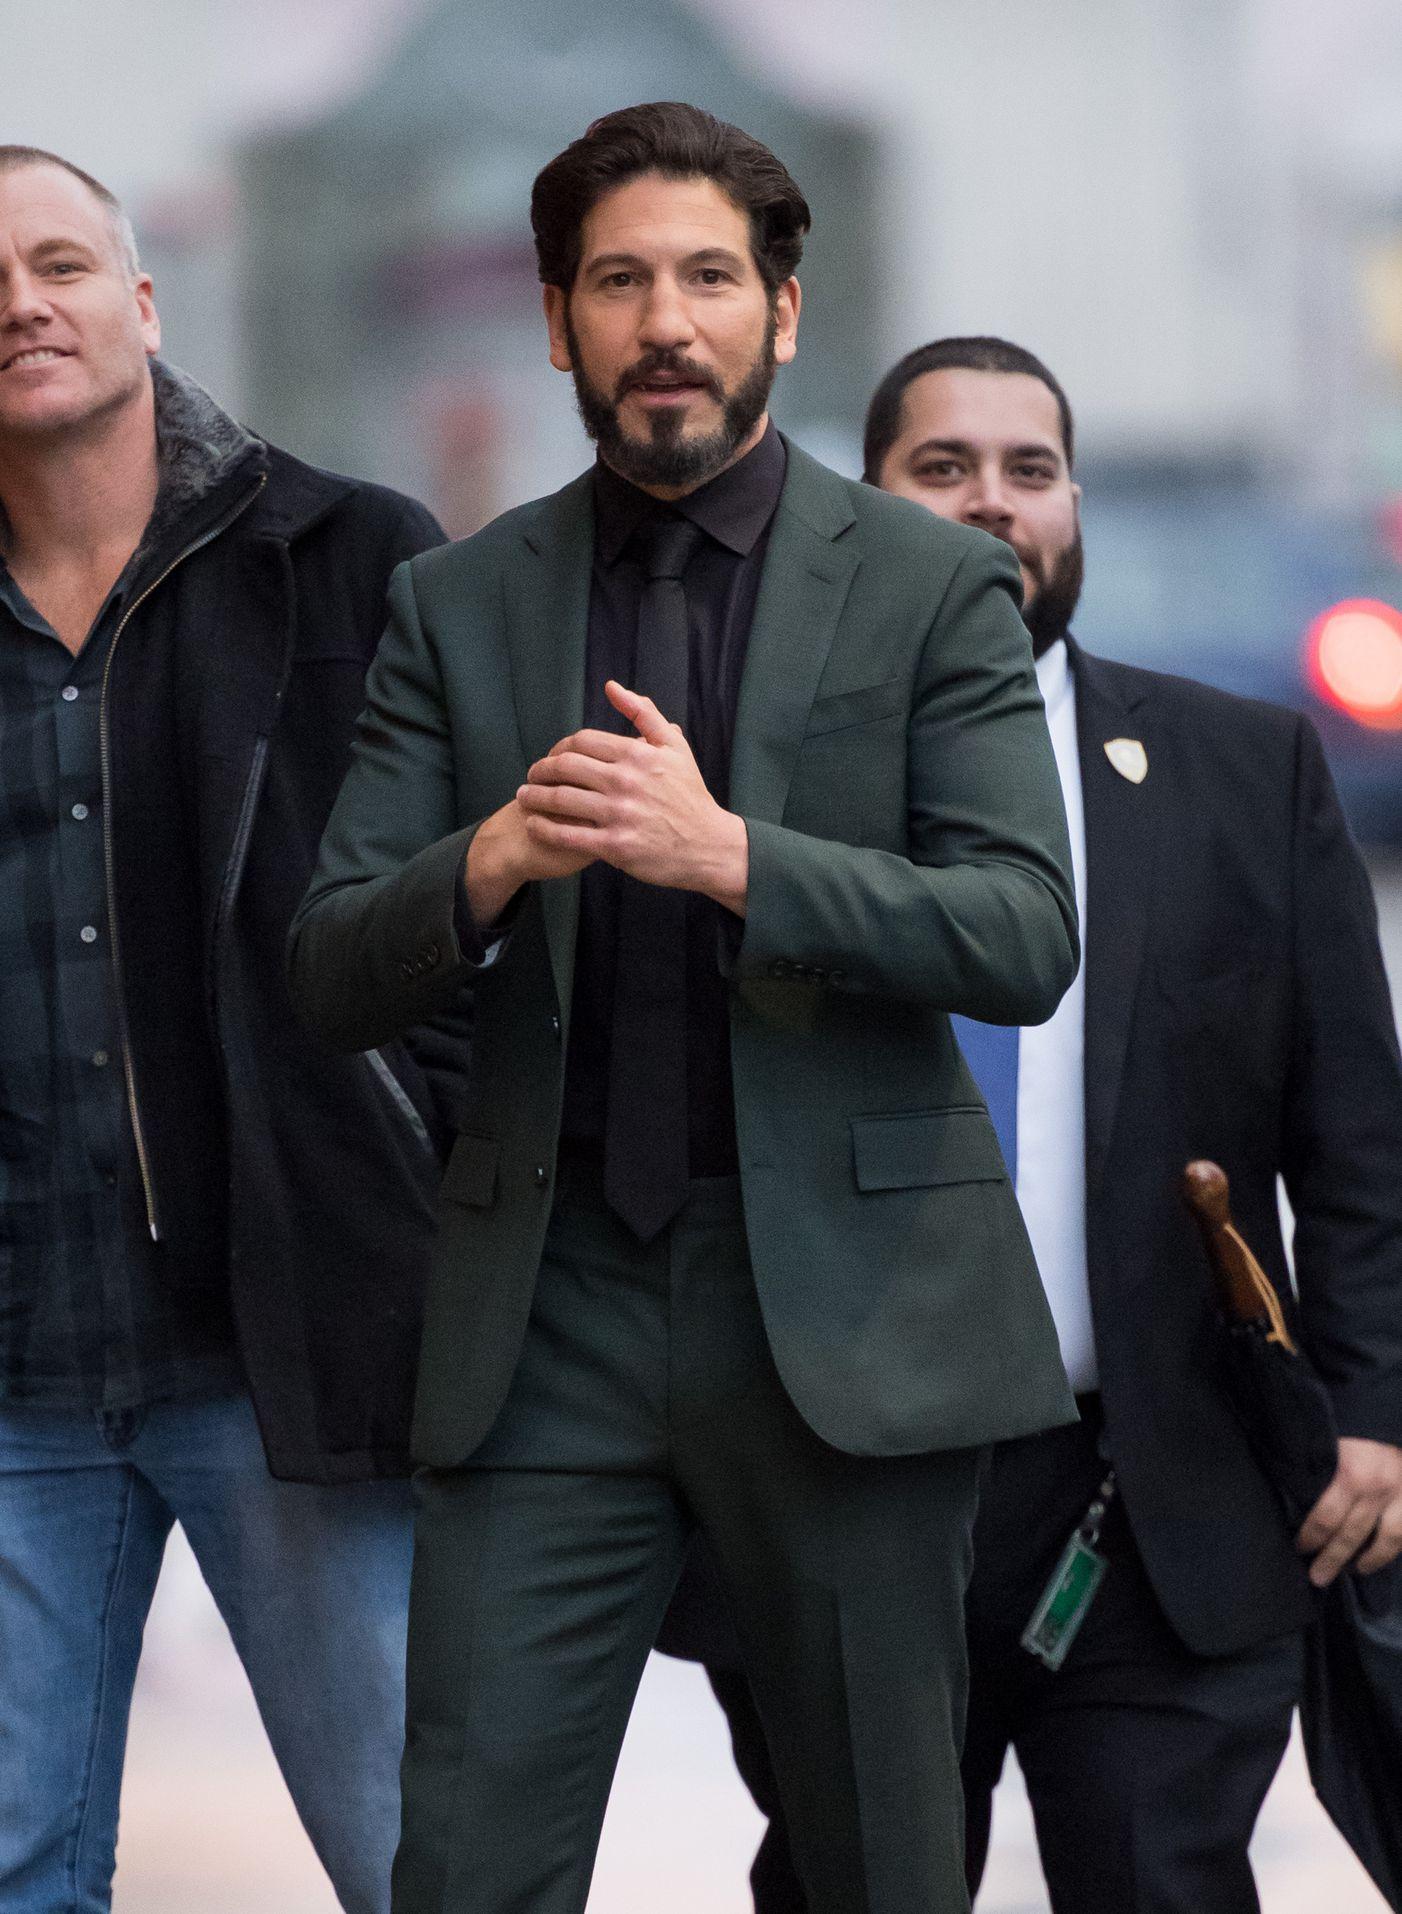 jon bernthal green suit